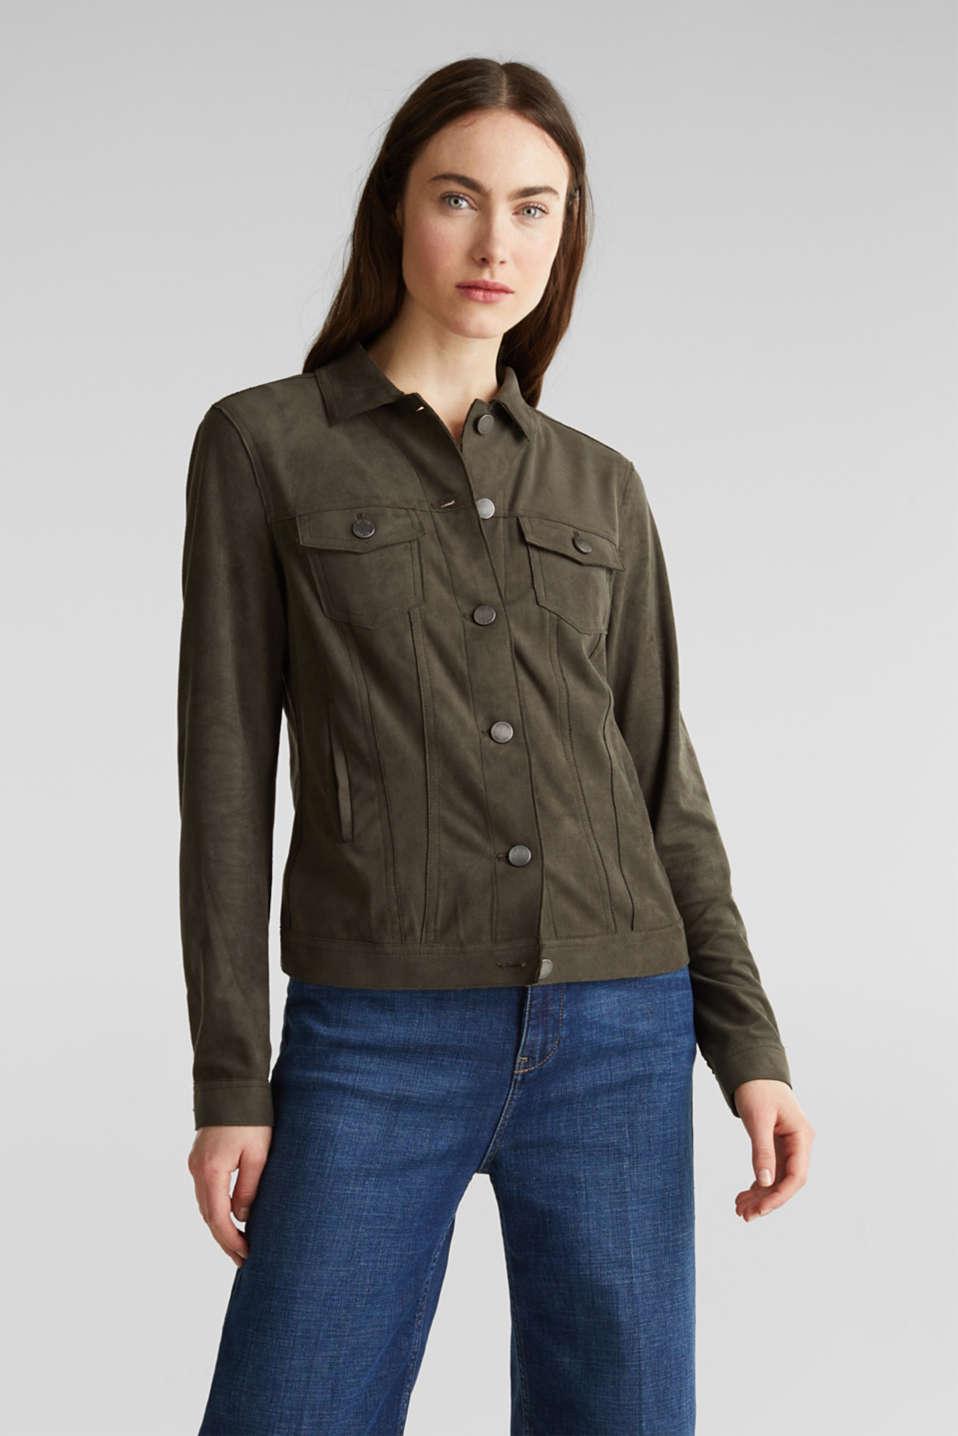 Soft faux suede jacket, KHAKI GREEN, detail image number 5